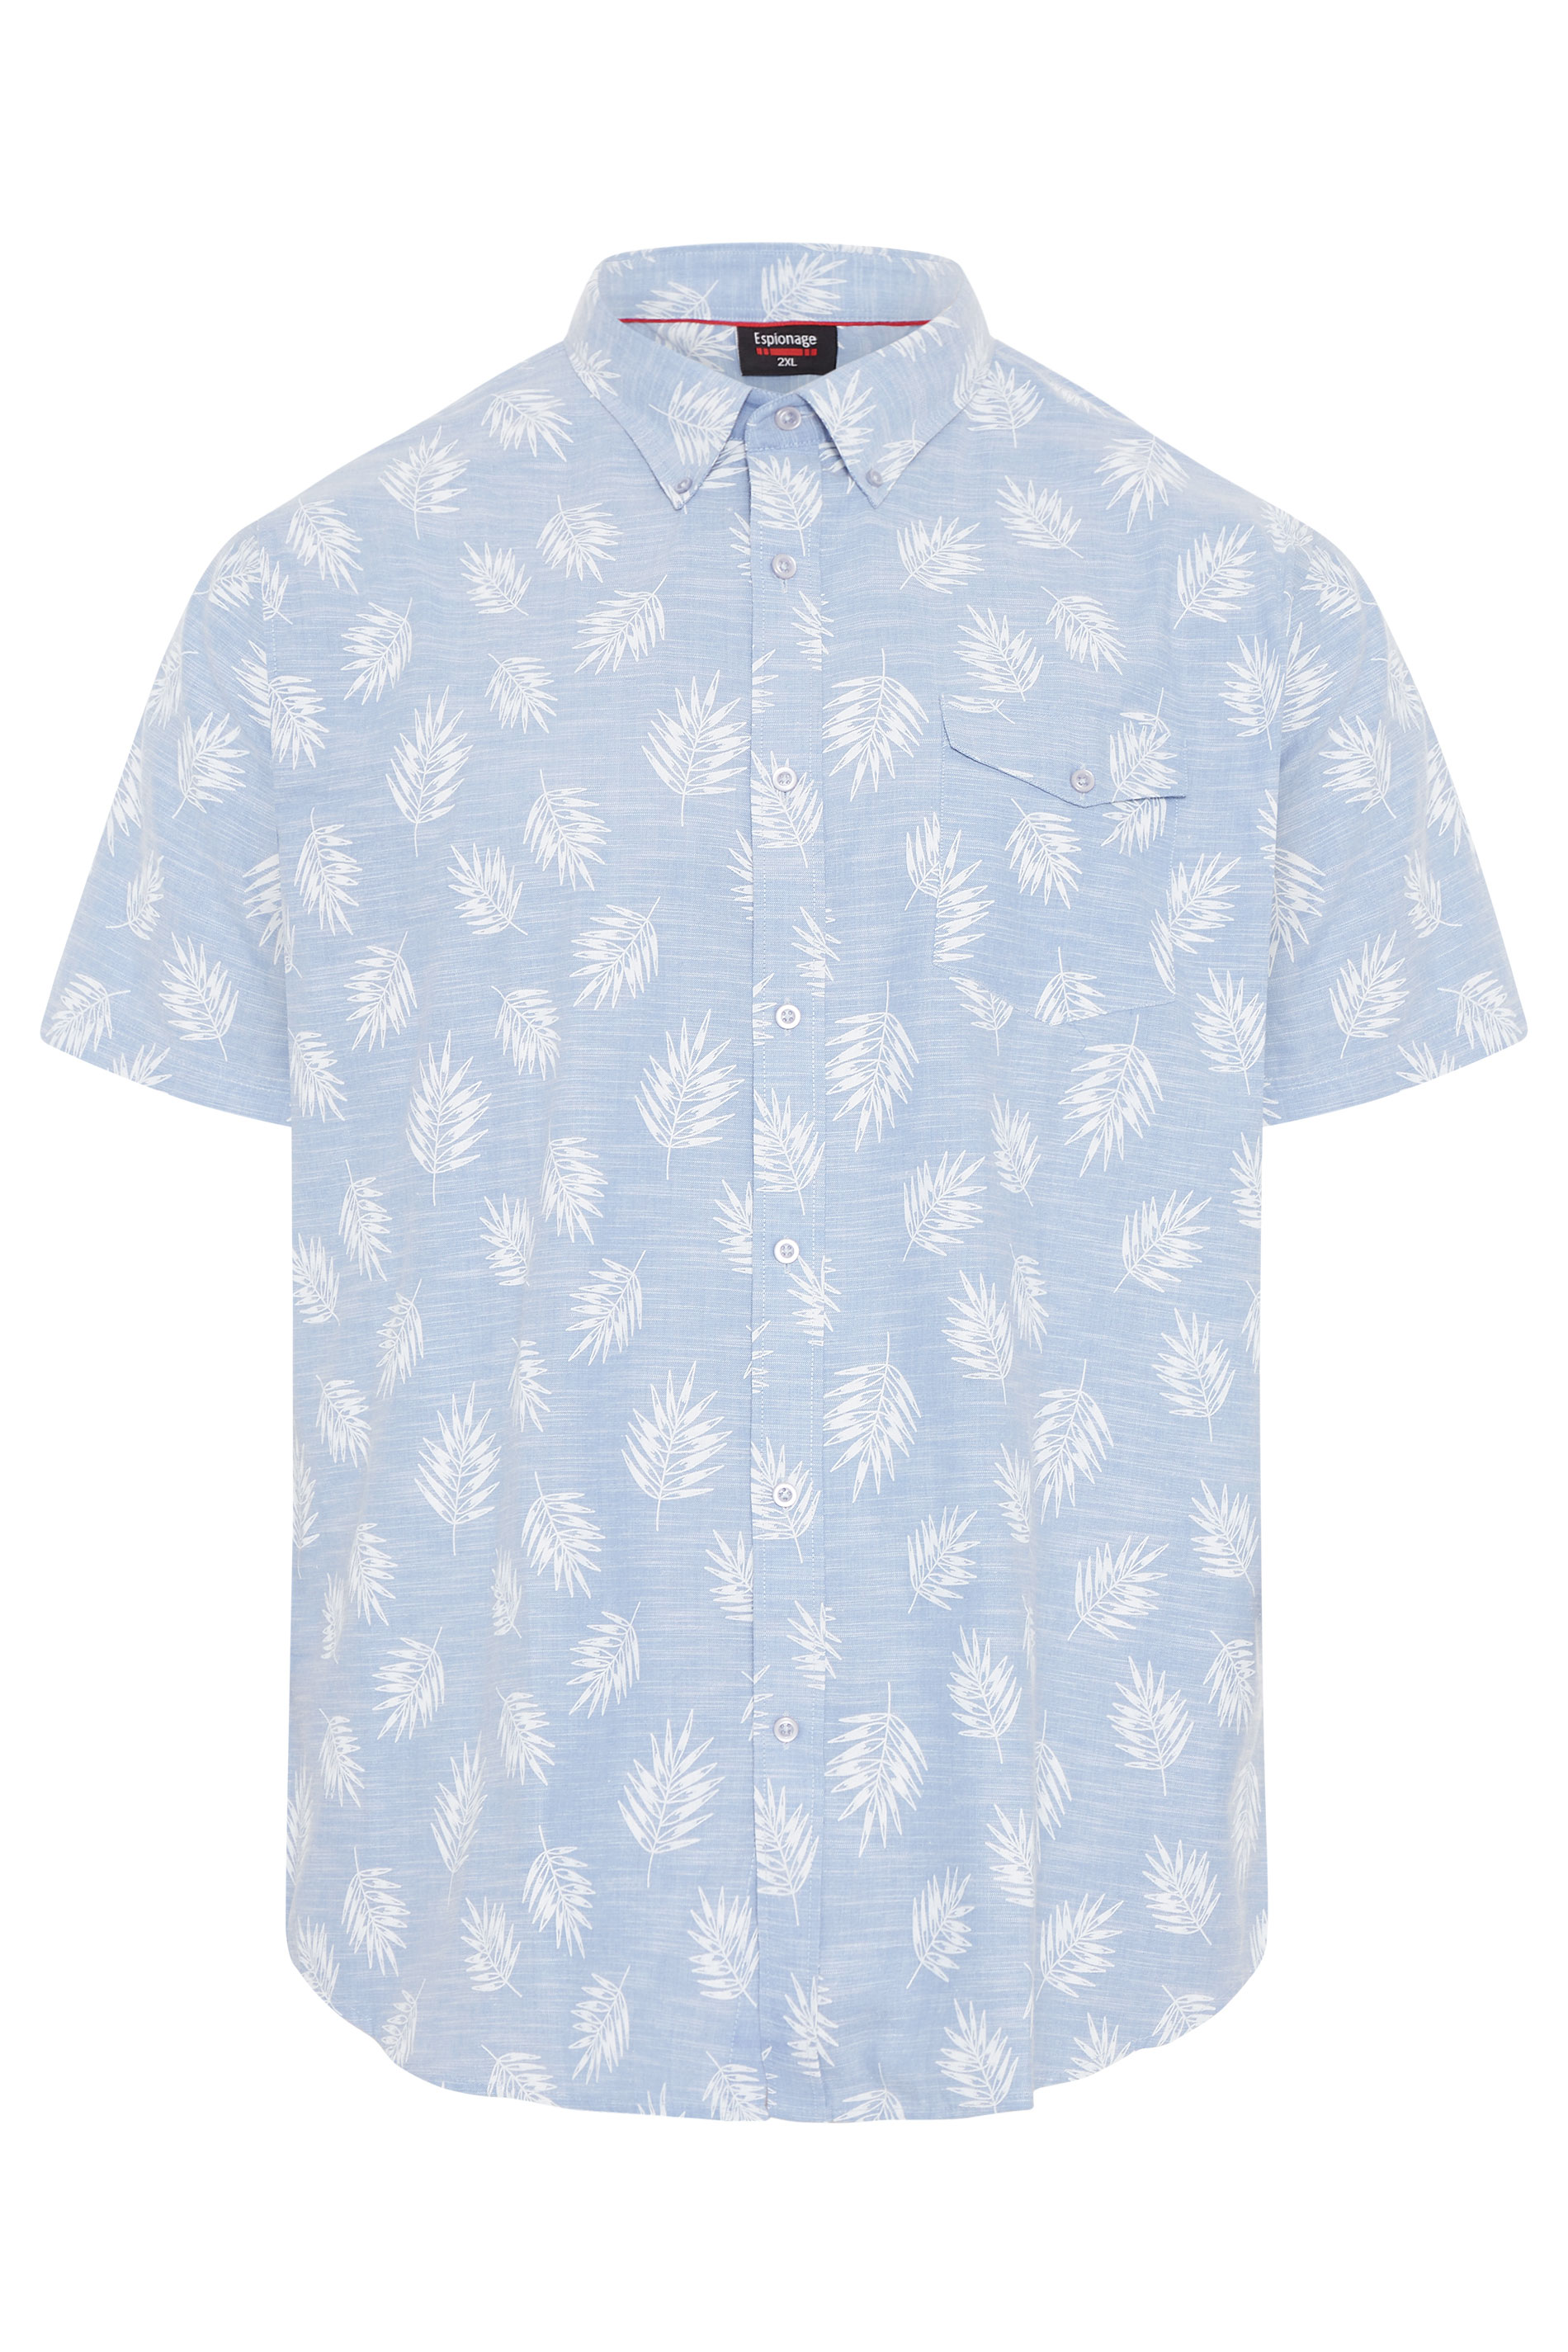 ESPIONAGE Light Blue Leaf Print Button Down Shirt